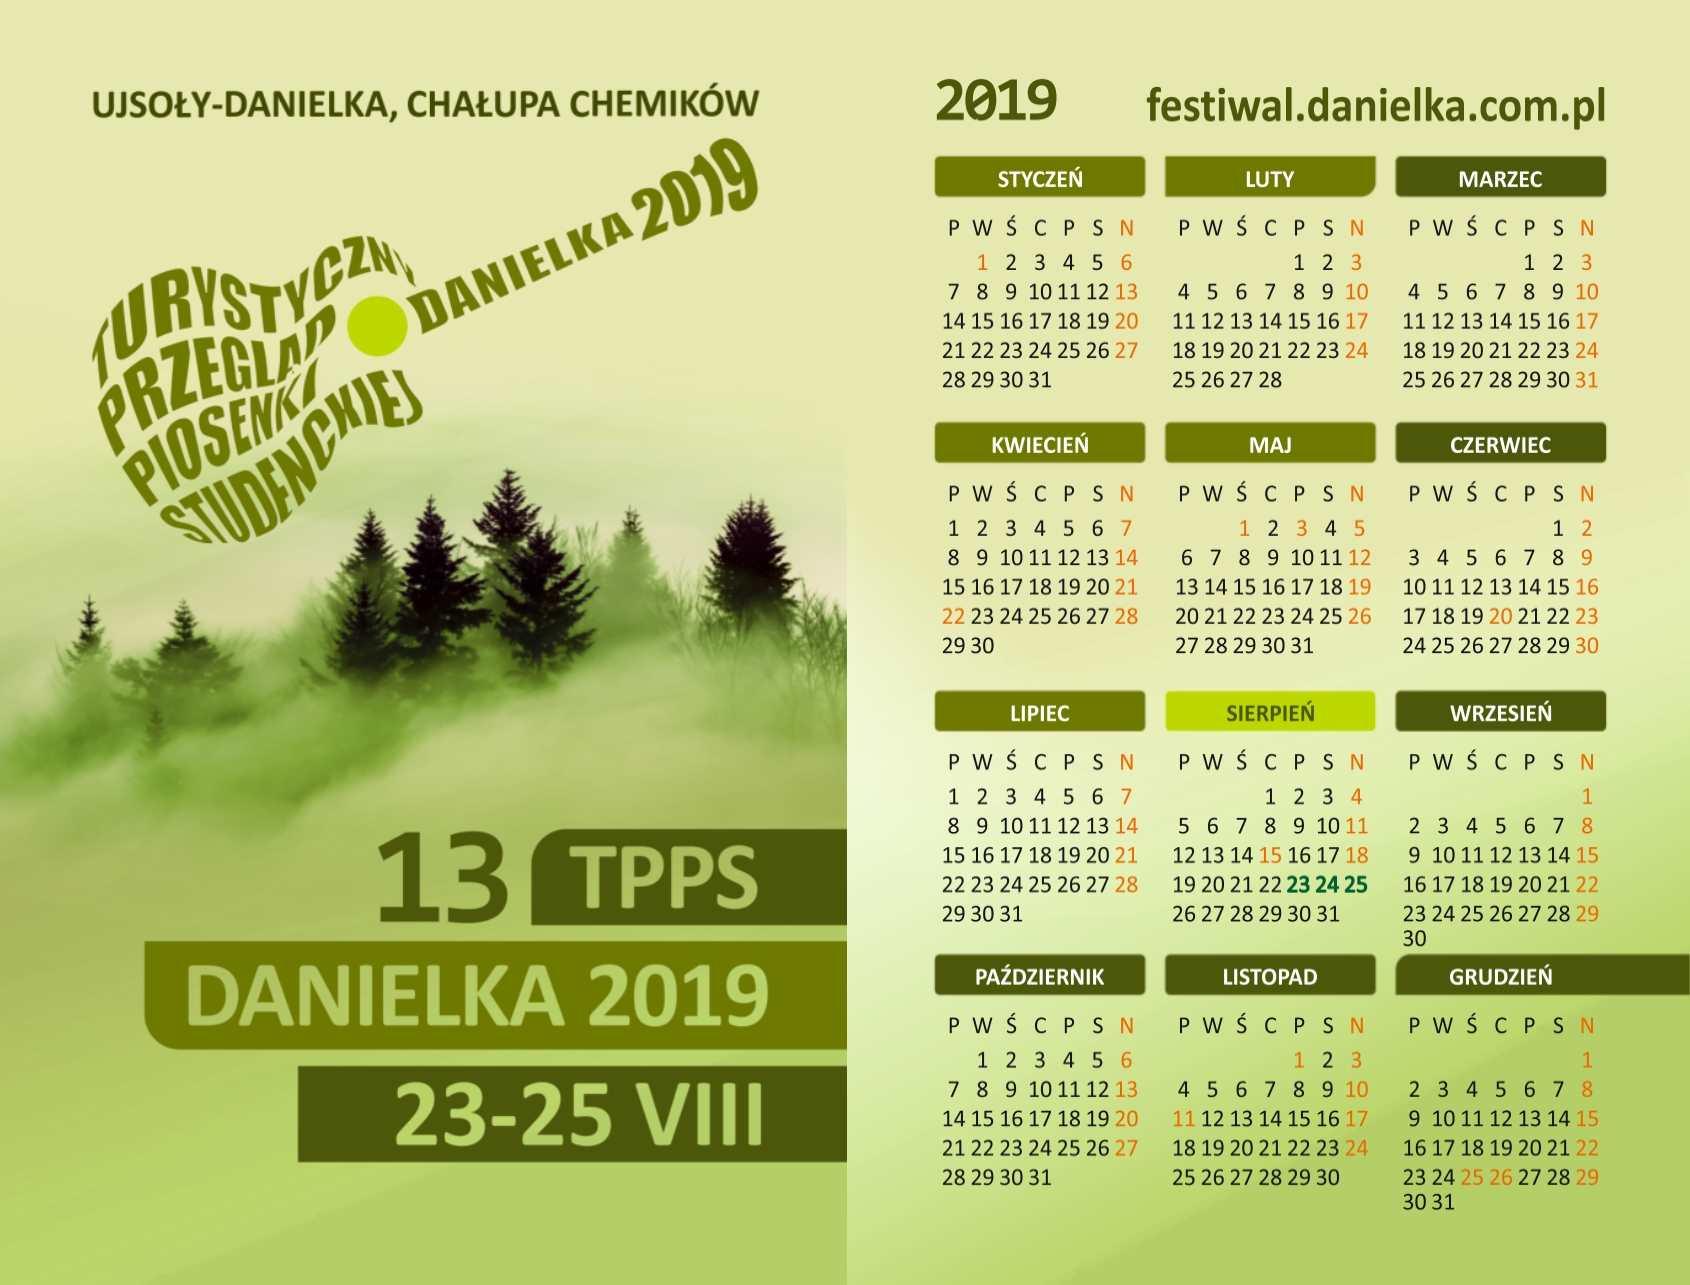 Danielka 2019